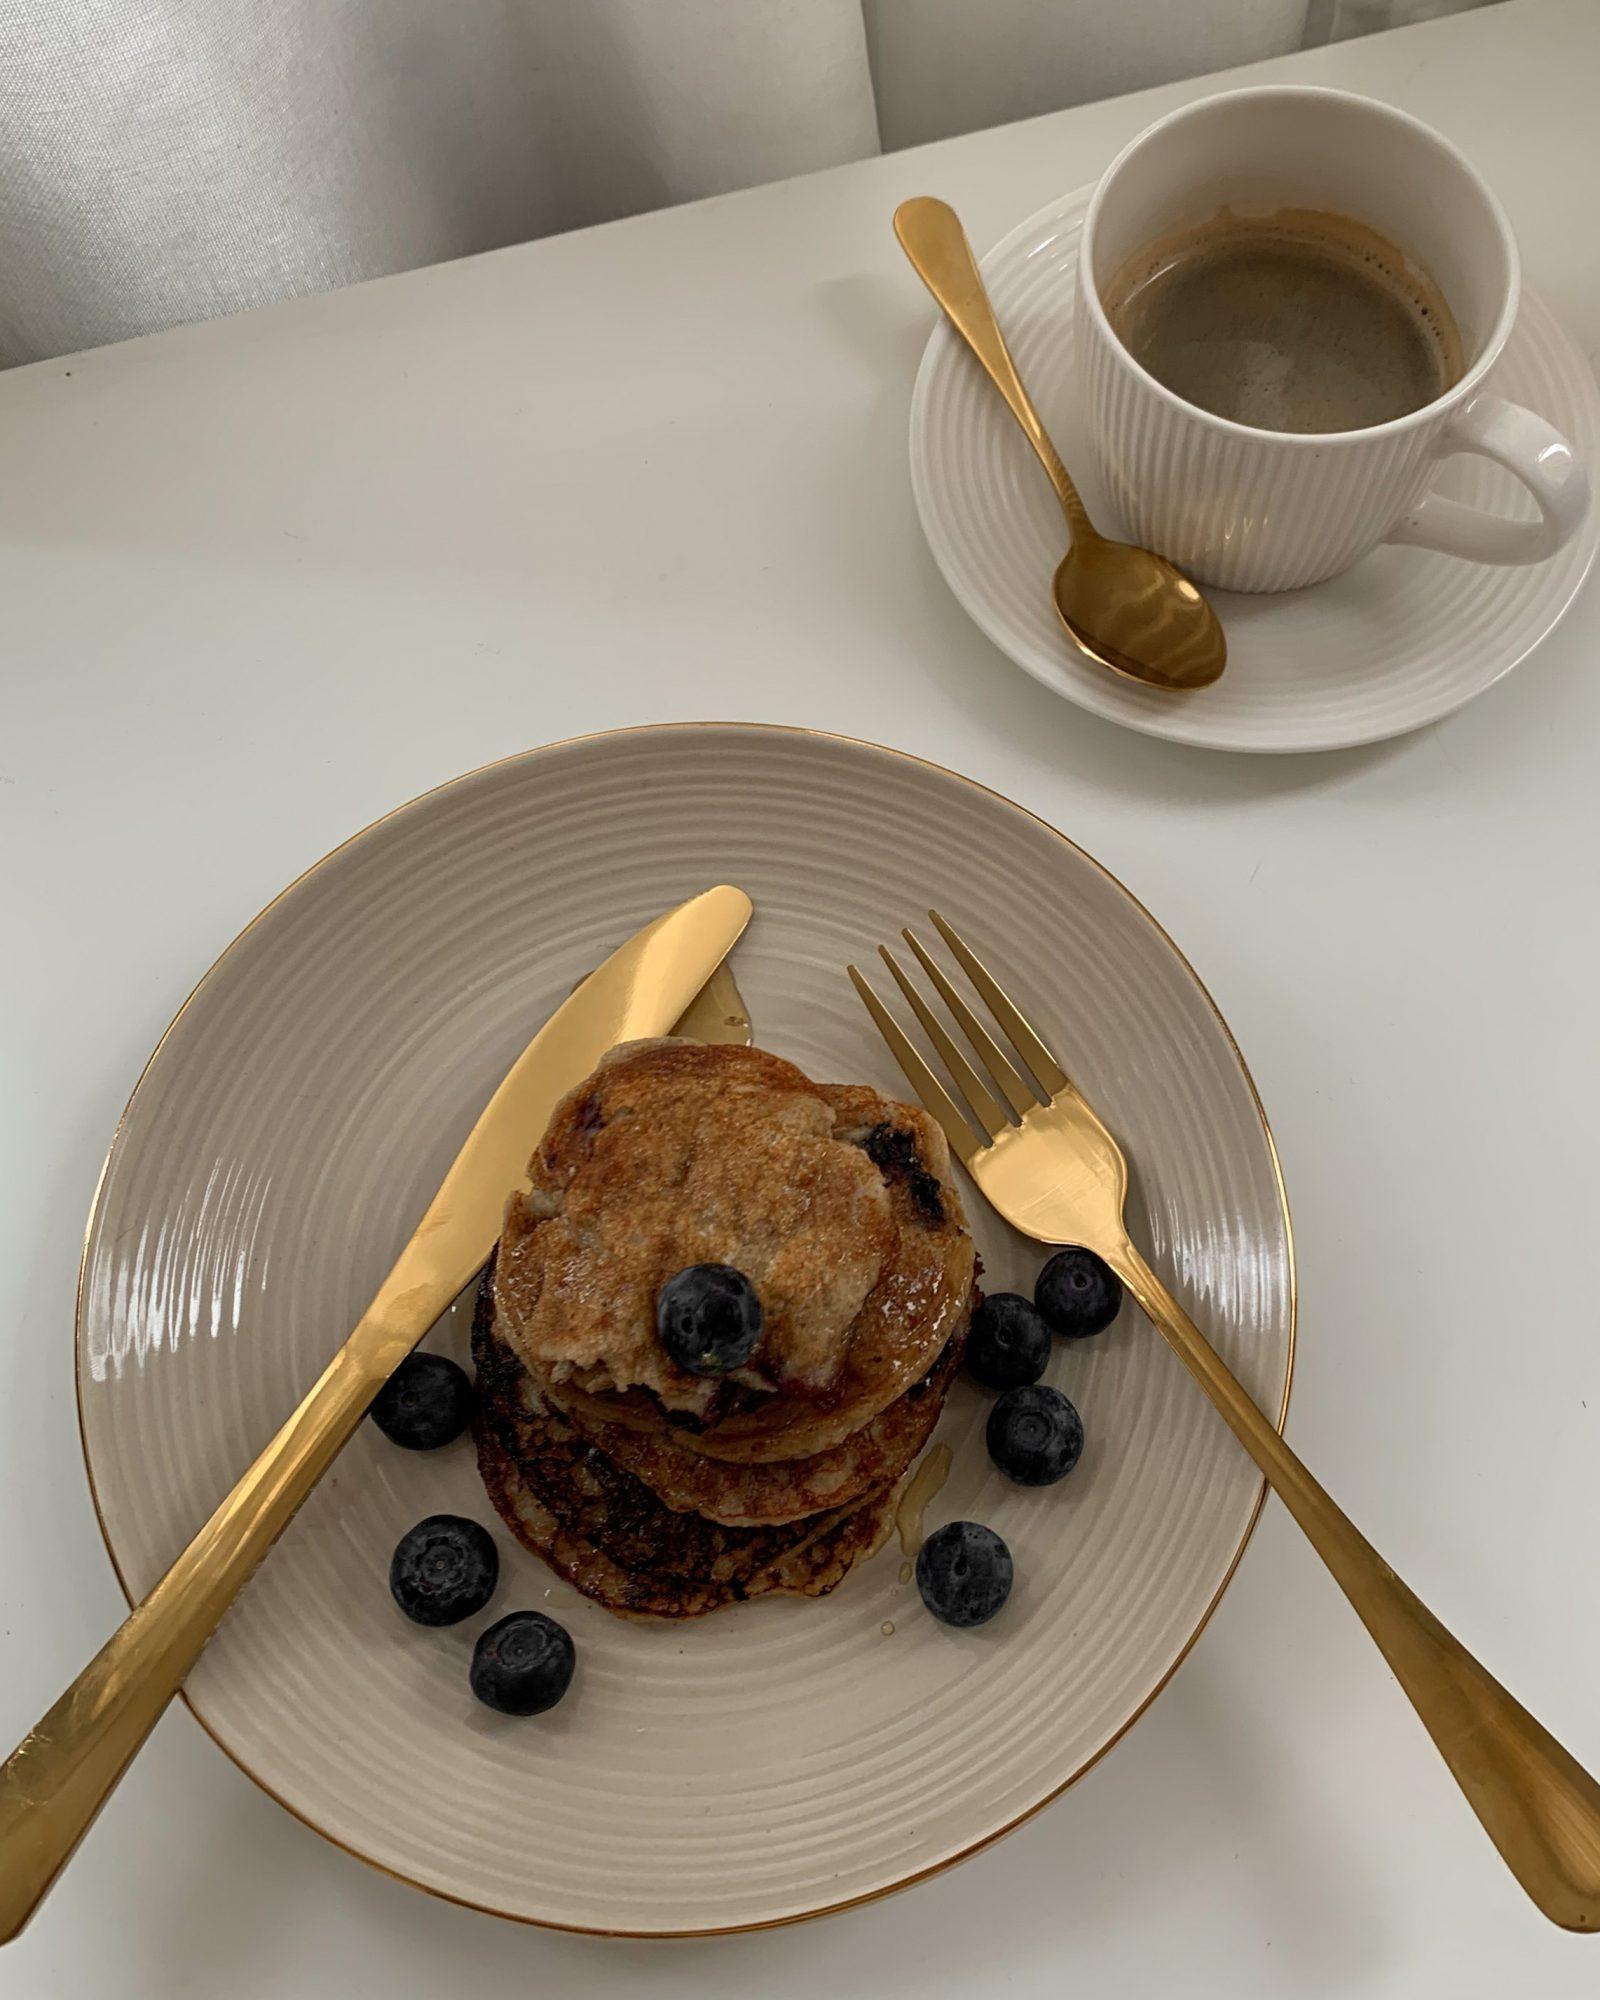 Image for Vegan Coconut Blueberry & Banana Pancakes